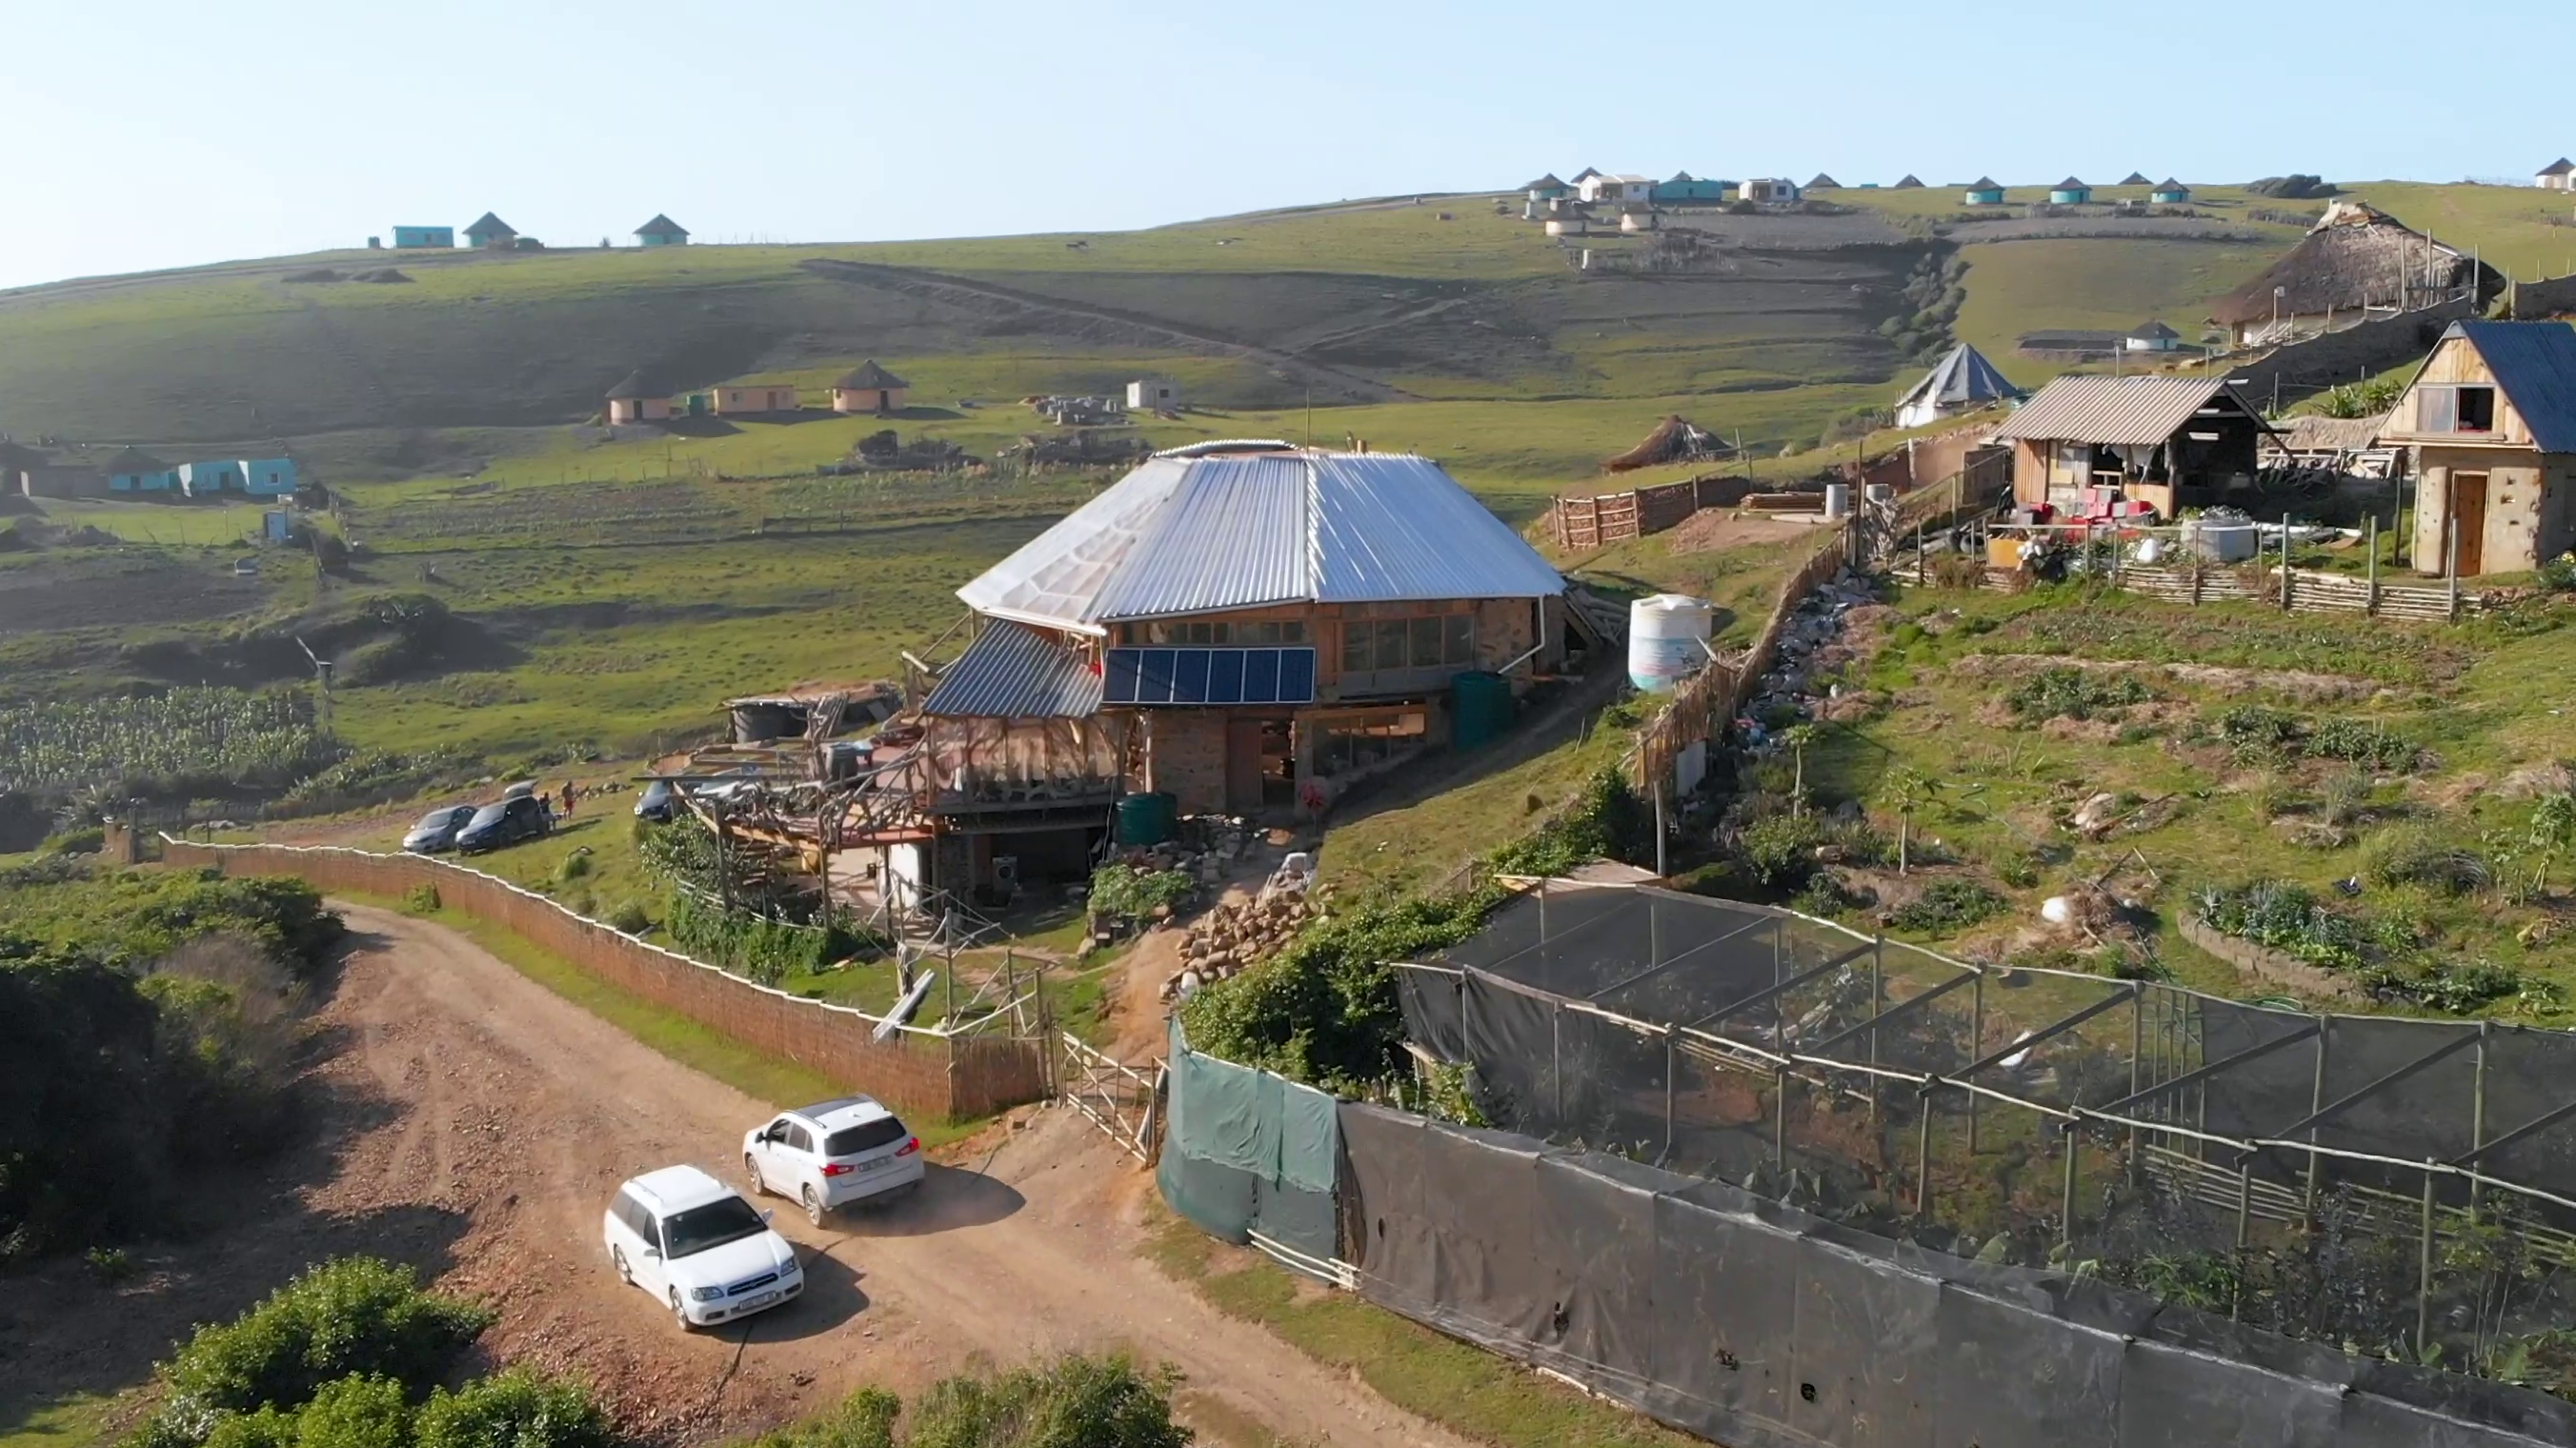 Wild Lubanzi Main Building